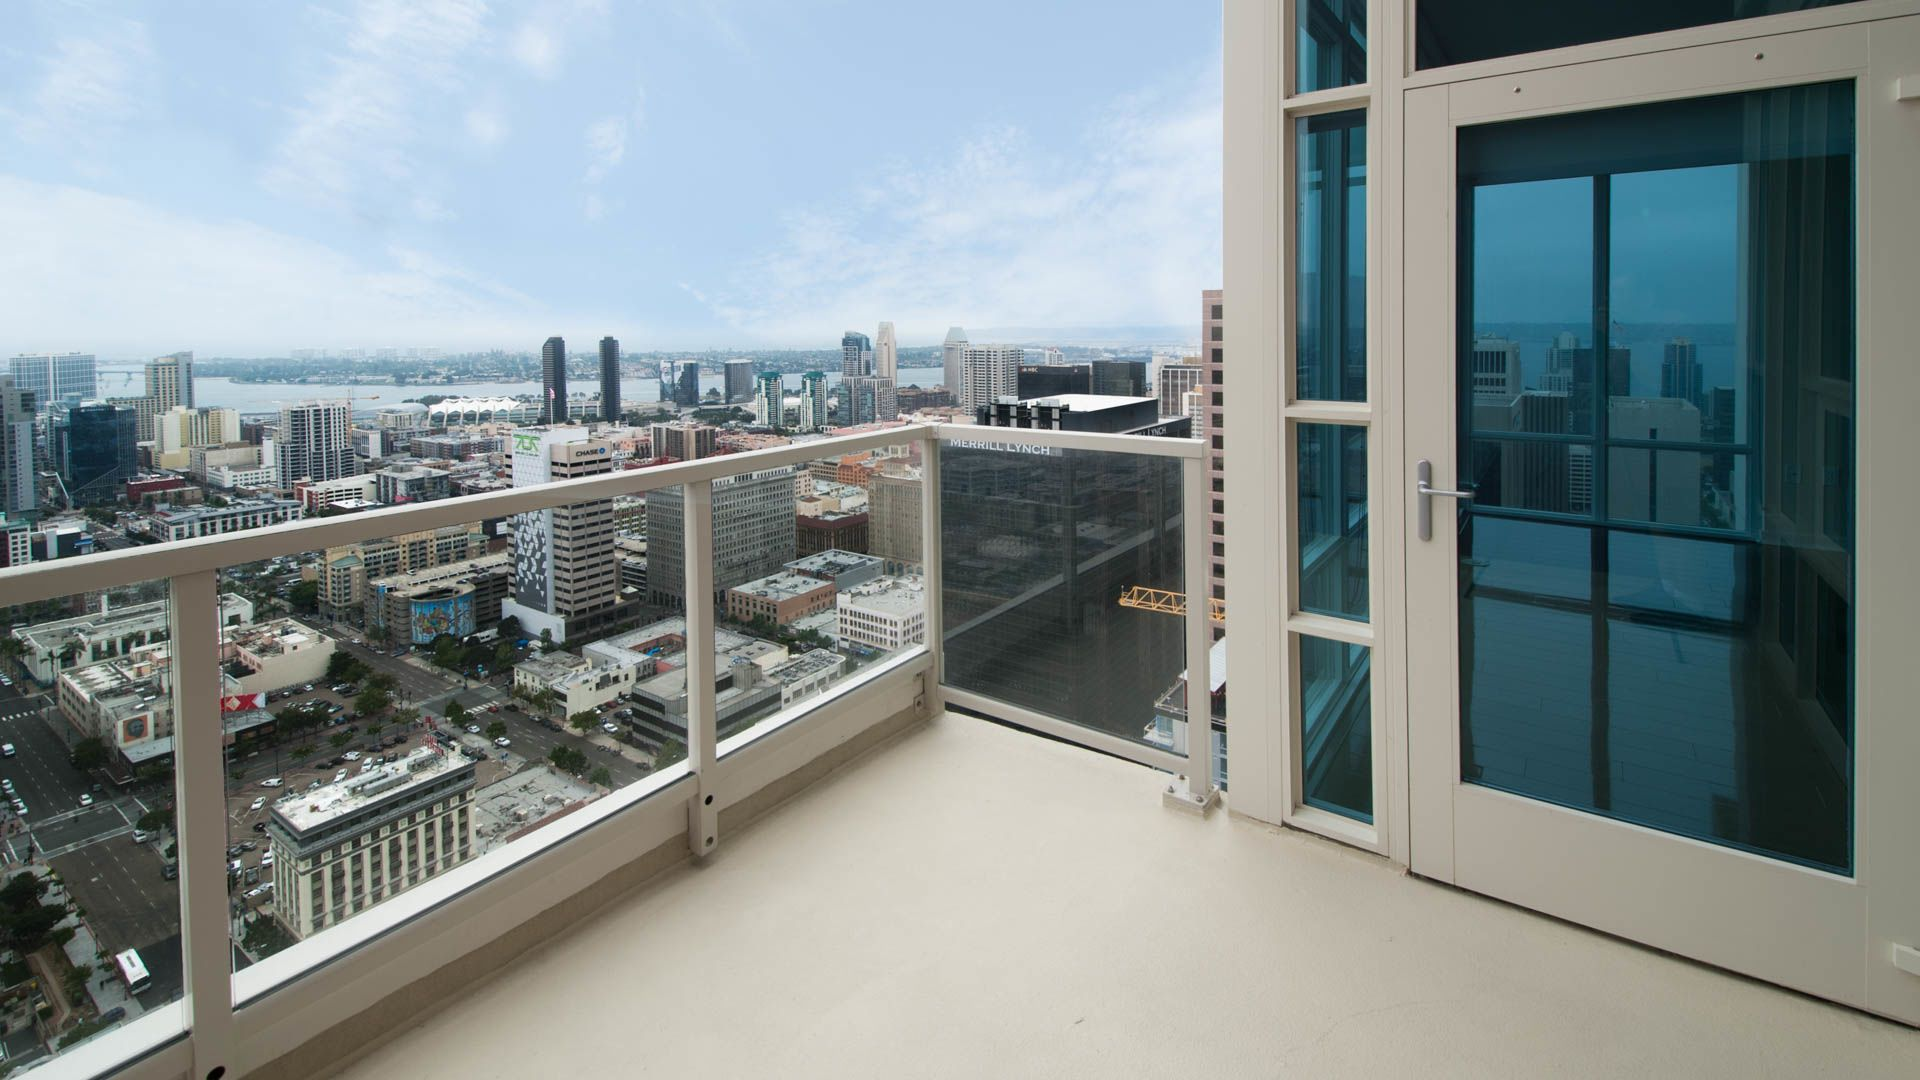 Vantage Pointe Apartments Downtown San Go 1281 9th Avenue 112 Equityapartments